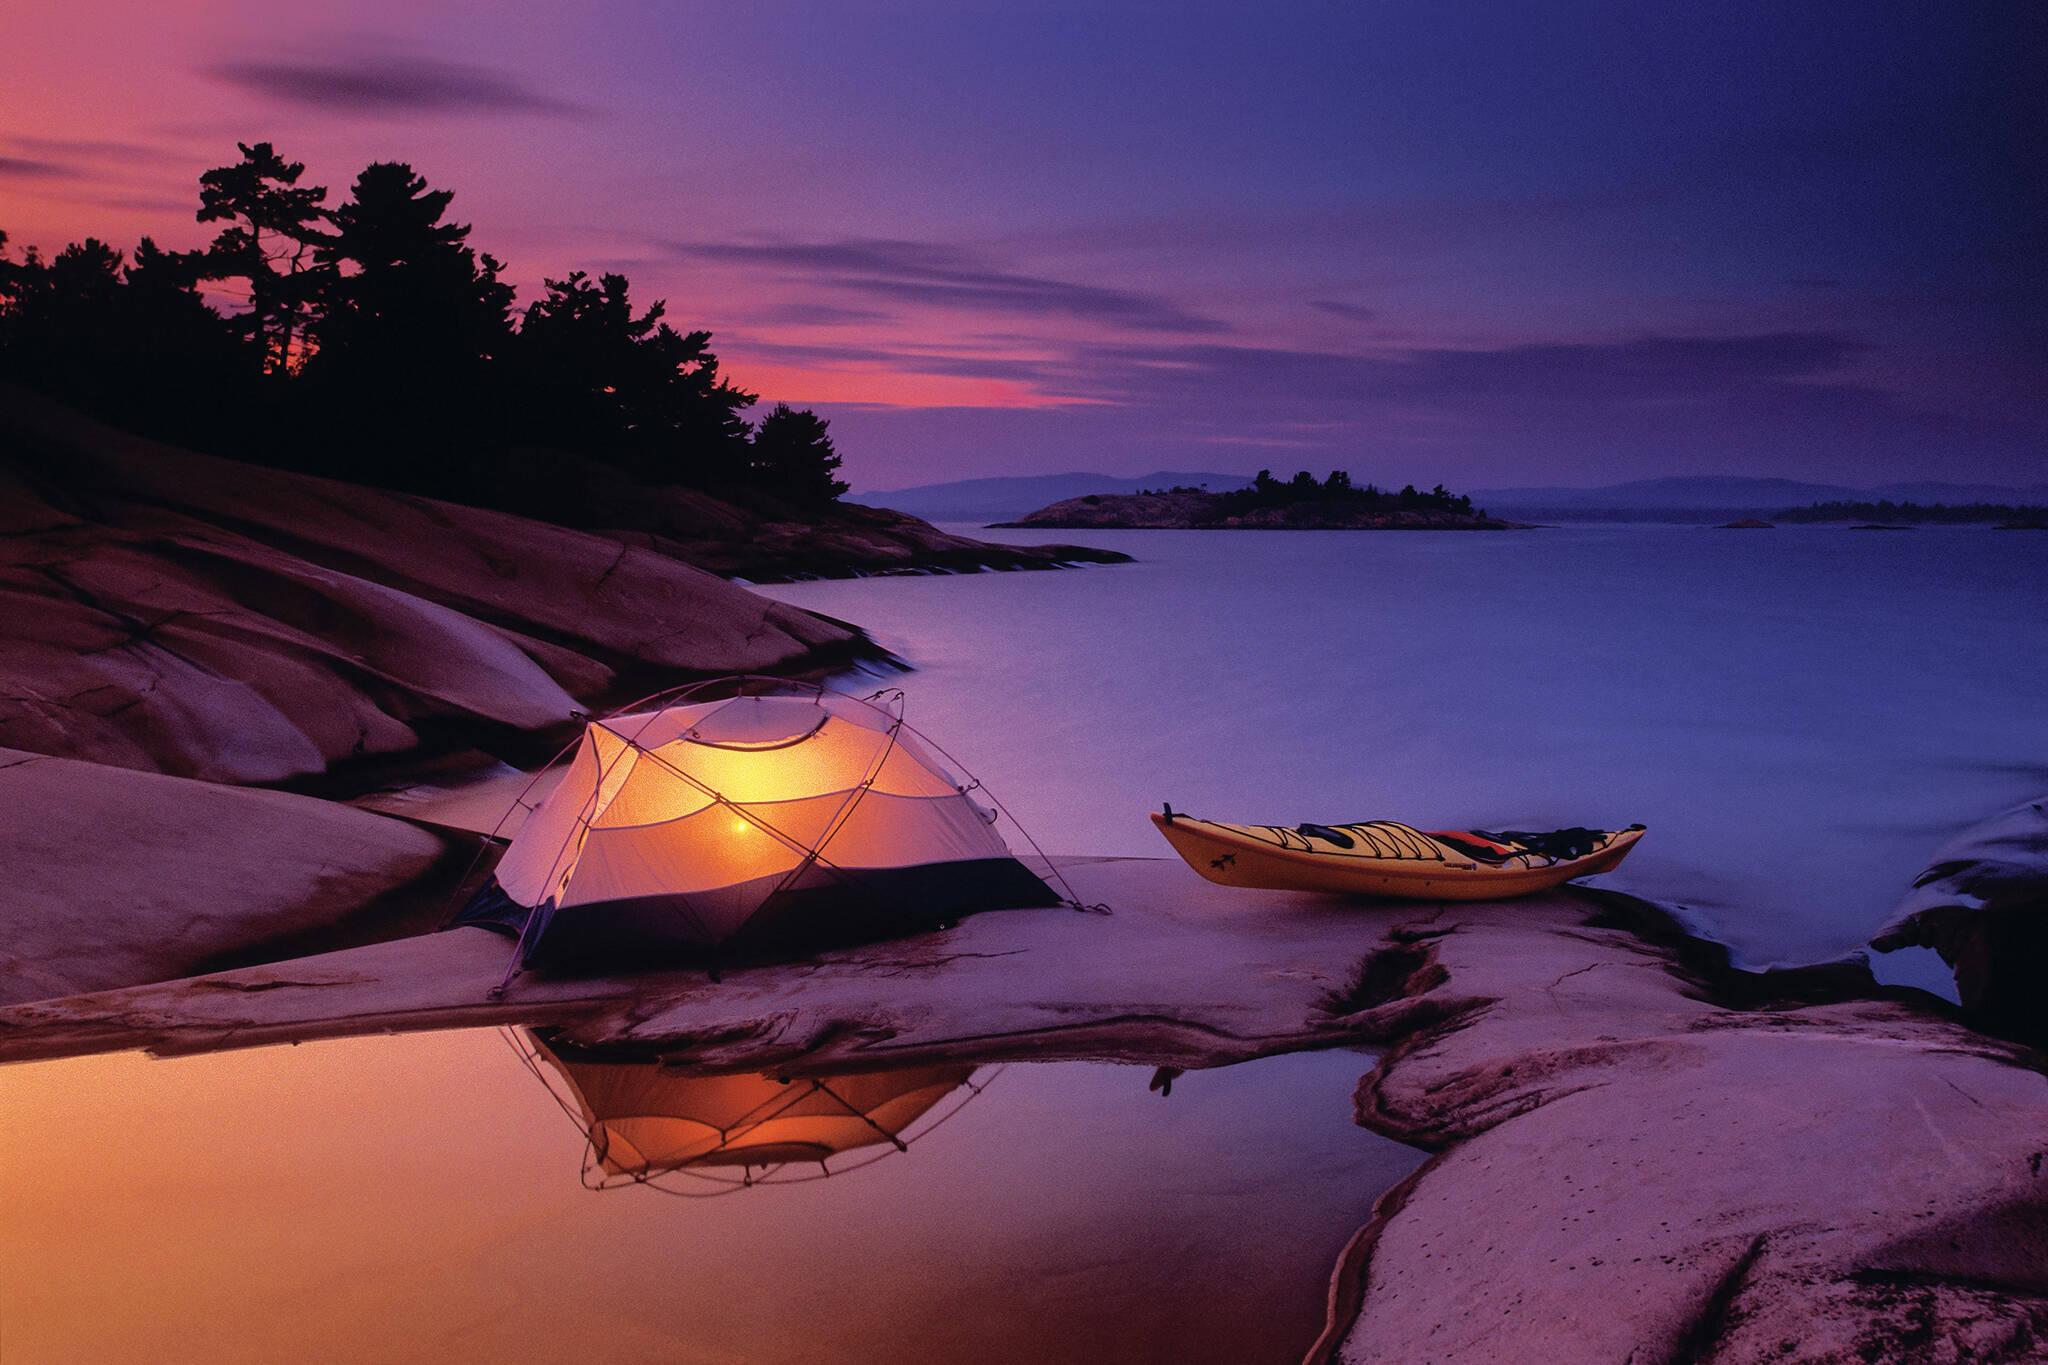 The 10 most beautiful campsites in Ontario